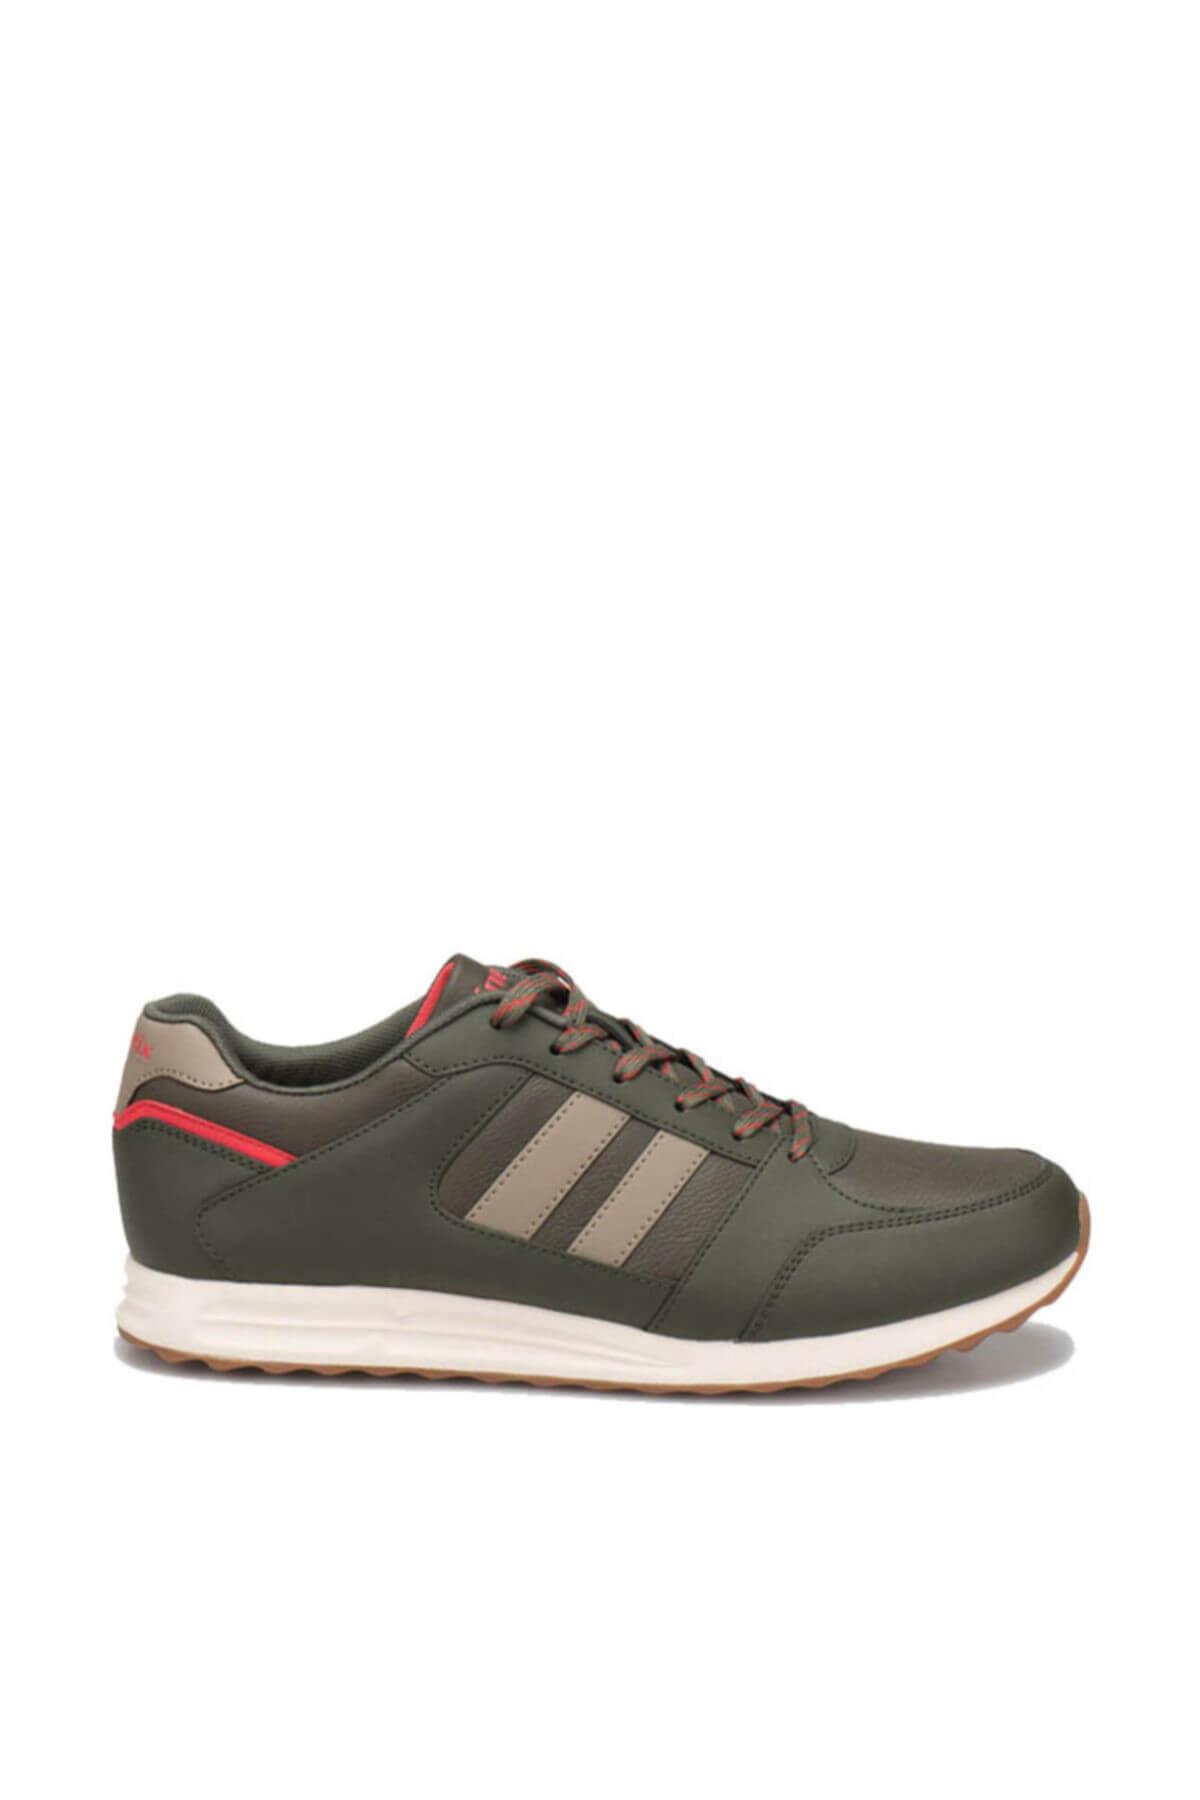 Kinetix REN M Haki Erkek Sneaker 100265367 2